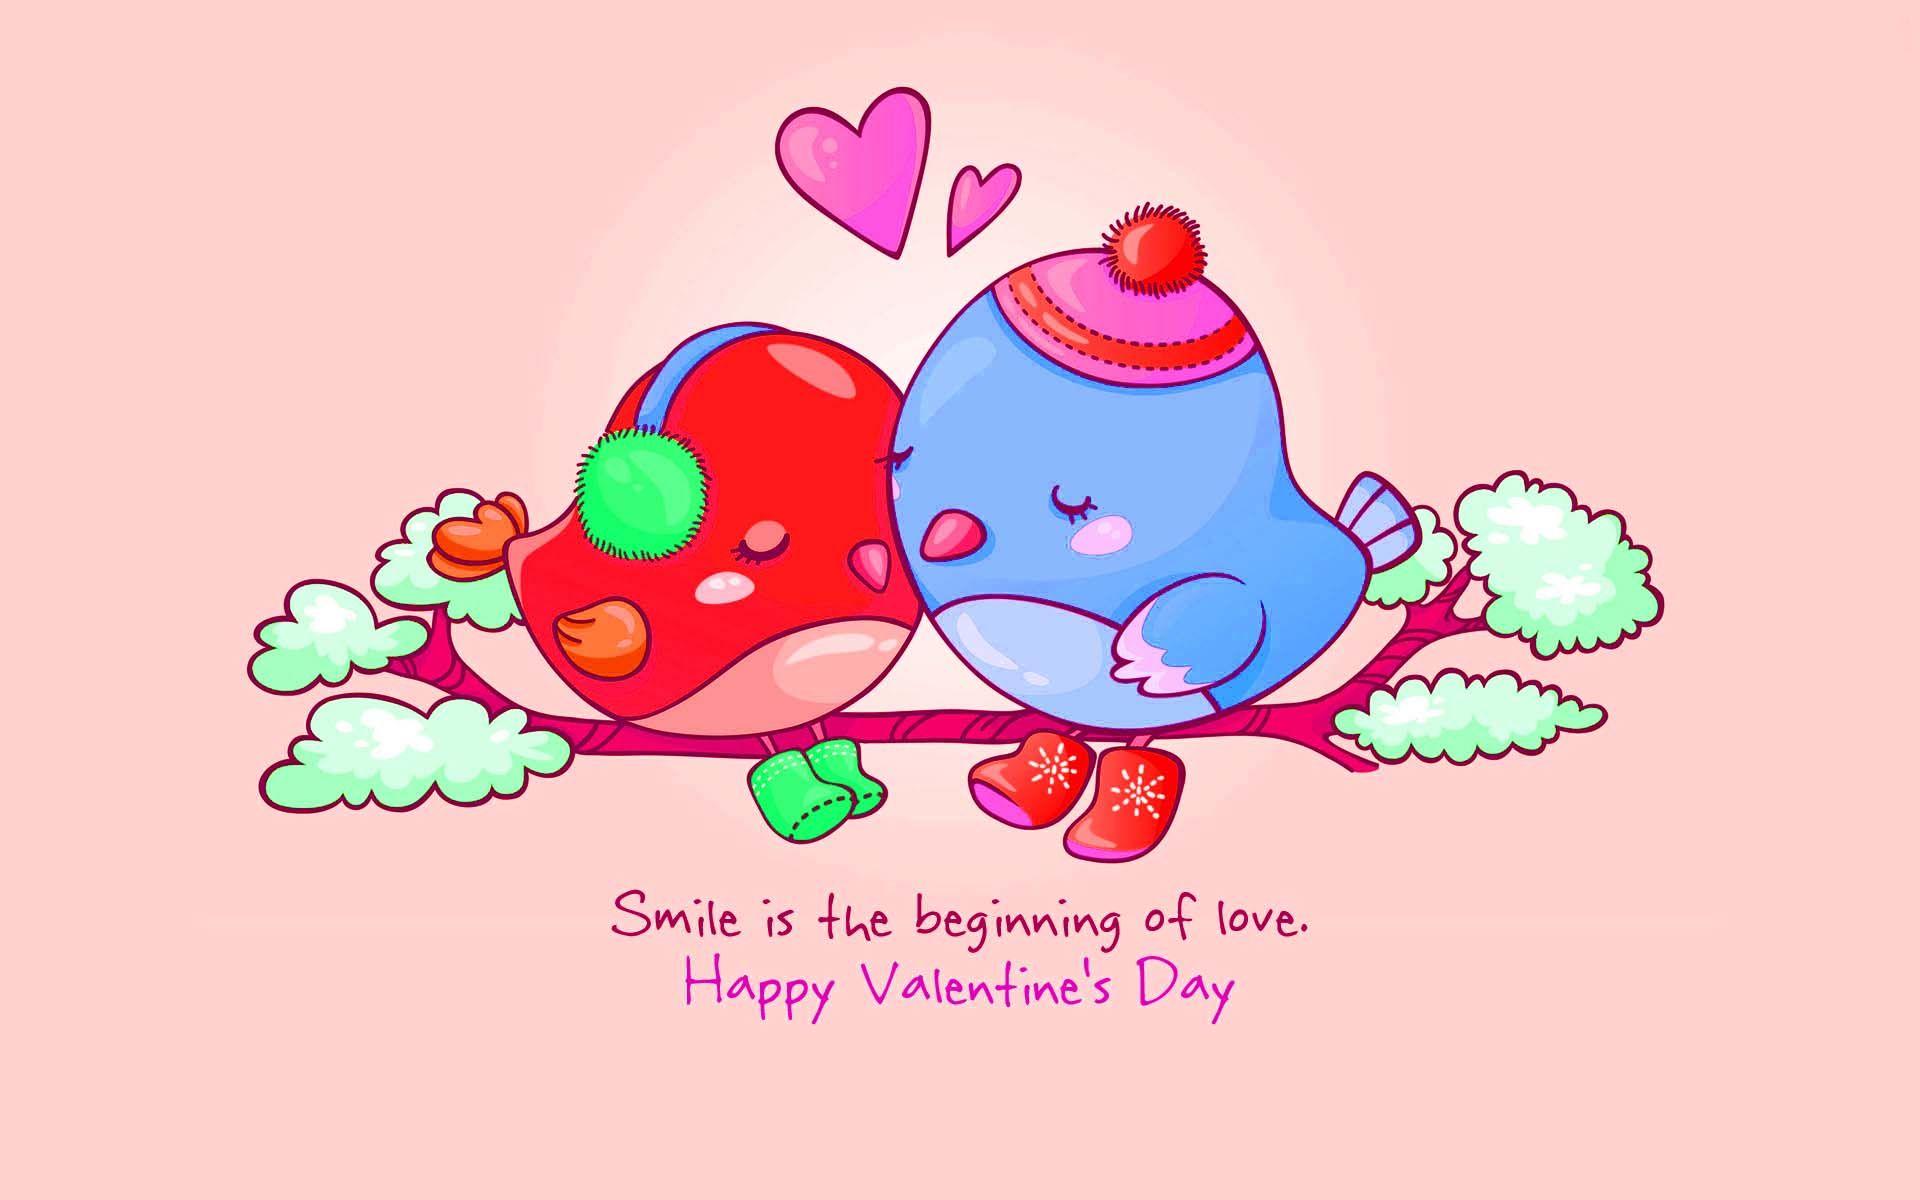 Cute Valentine's Day Wallpaper Happy Valentine's Day HD